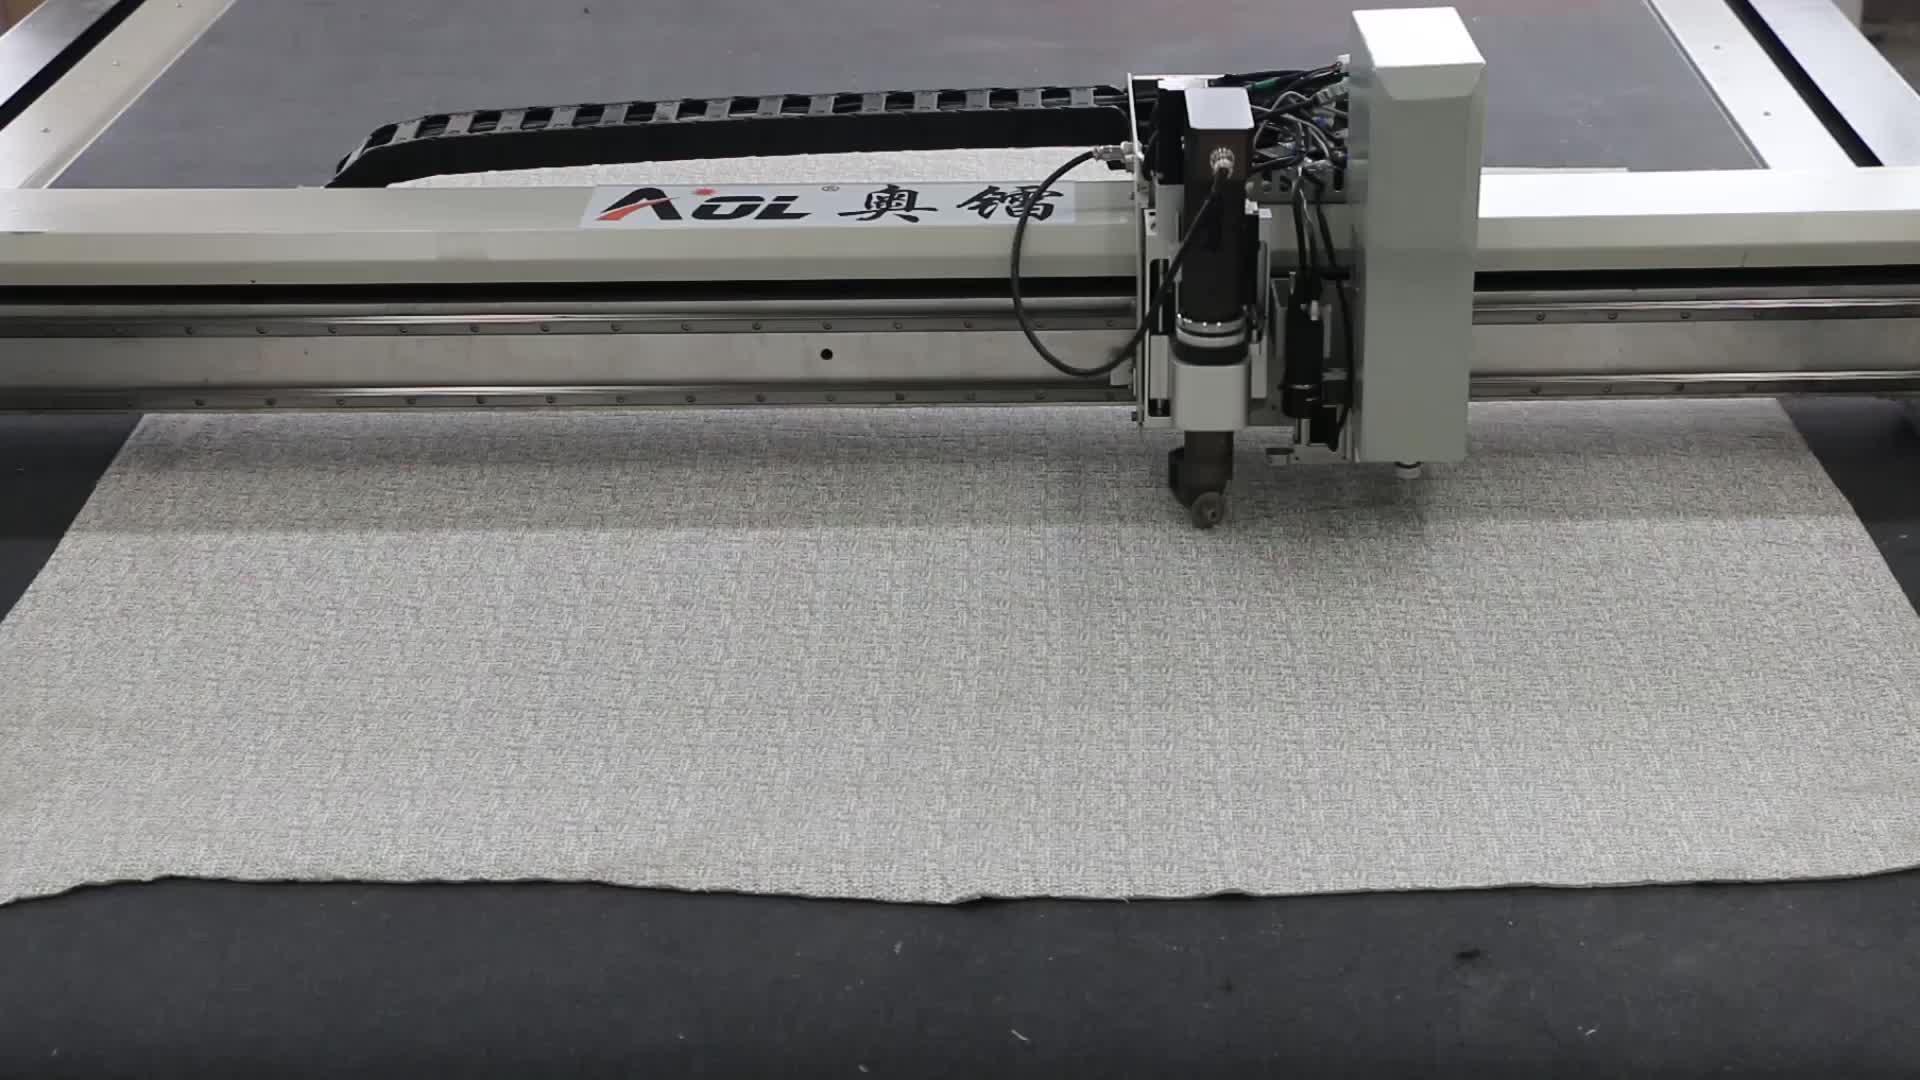 Automatische computerized kleding kledingstuk textiel cnc vibrerende ronde mes snijmachine in doek snijmachines